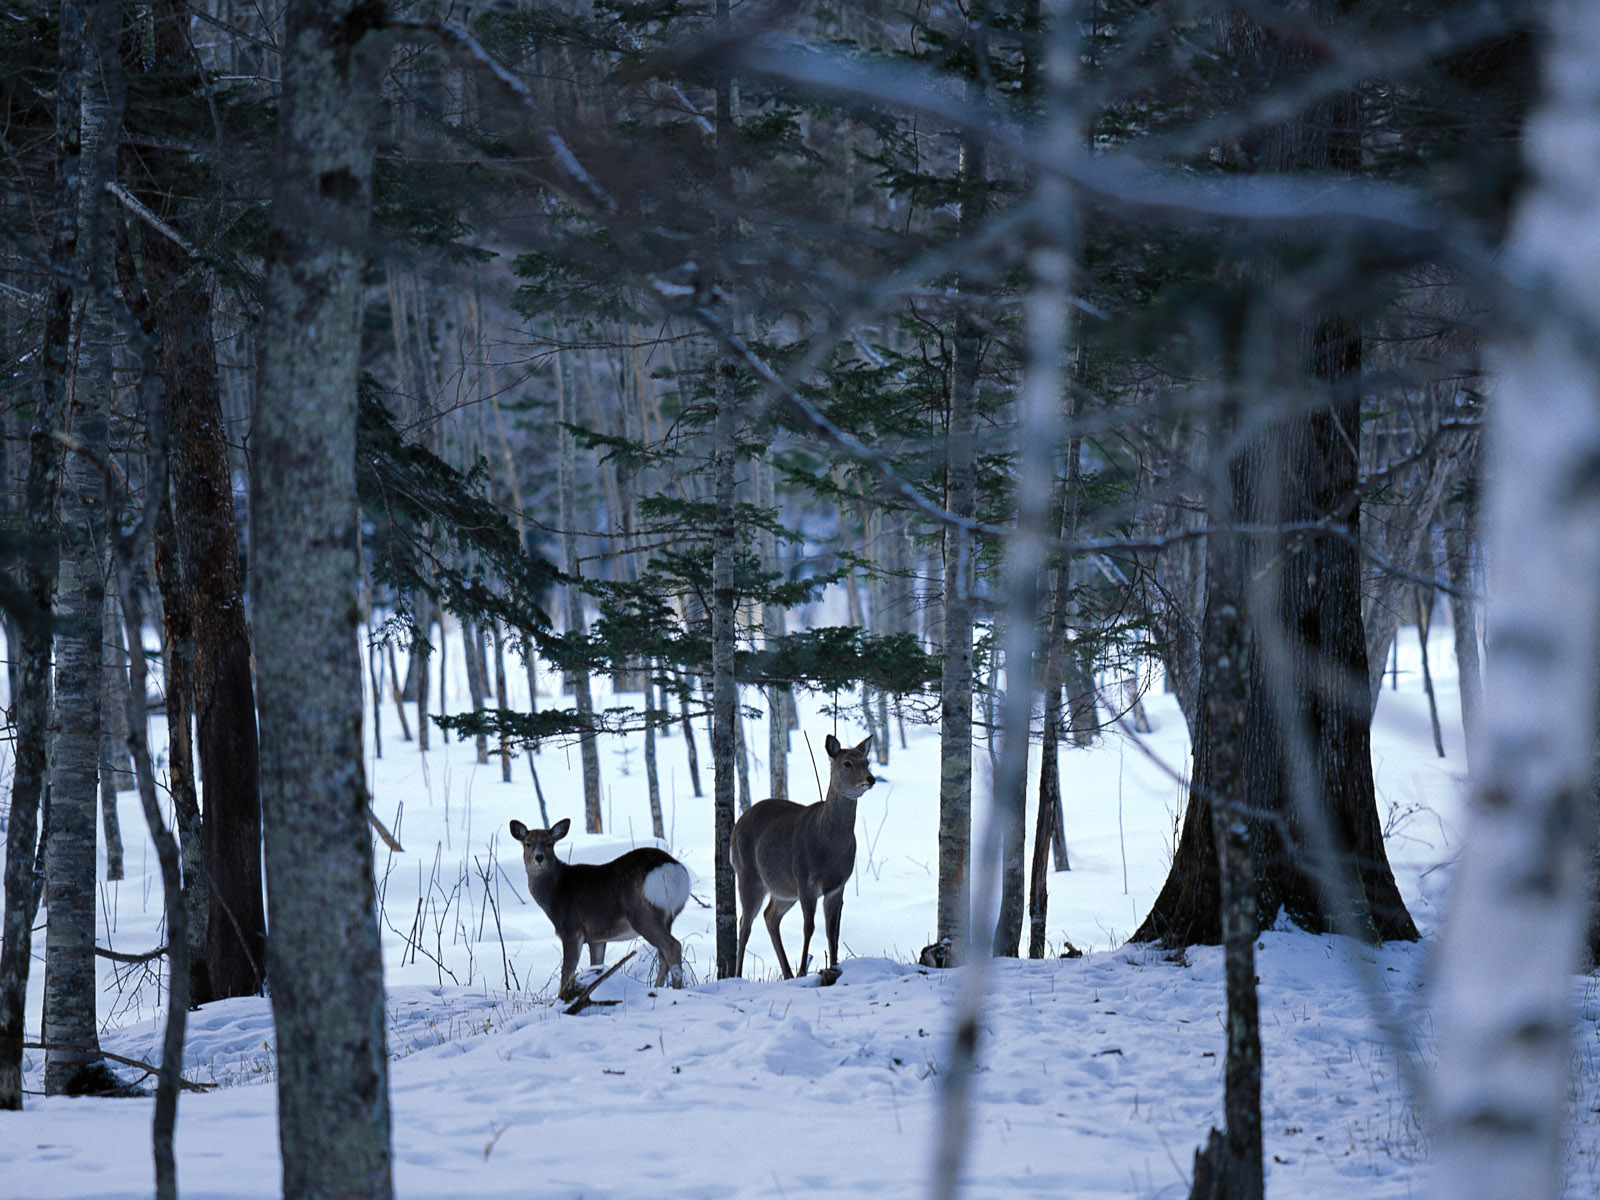 /Winter_wonderland_02/wallpapers/1600x1200/Snow_Winter_Scene_winter ...